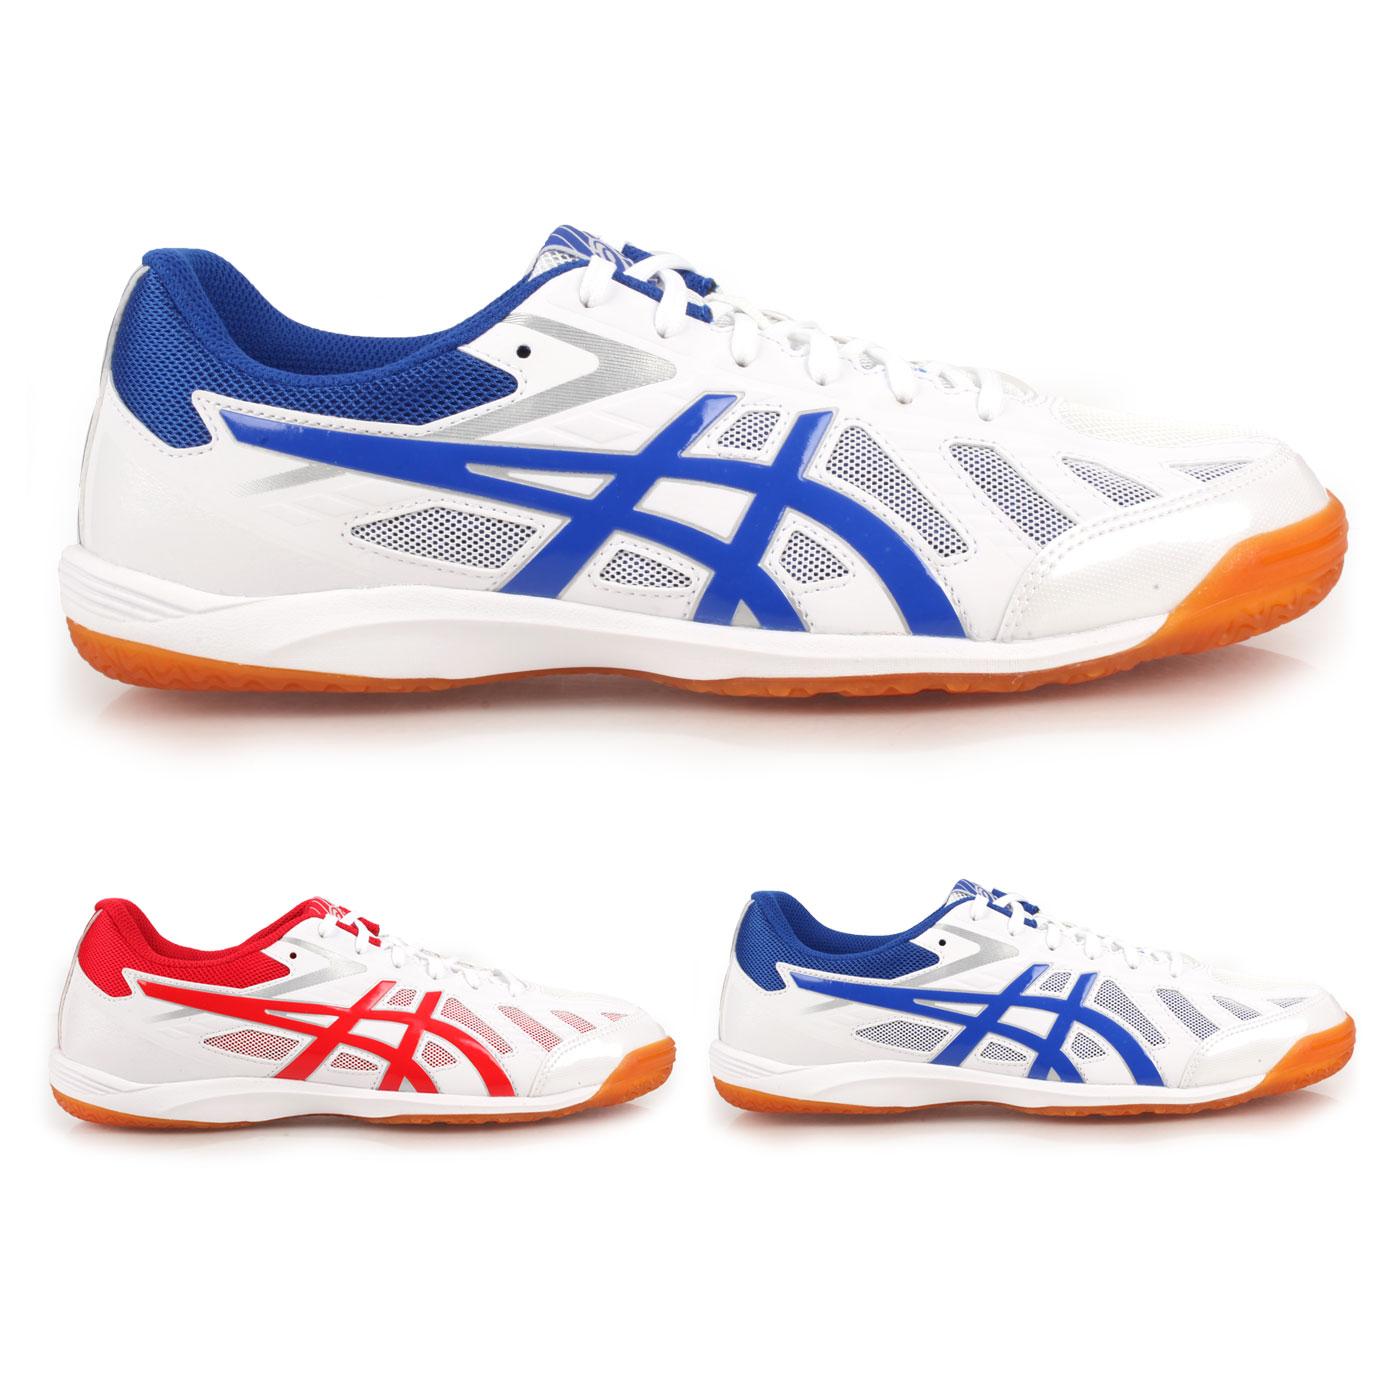 ASICS 桌球鞋  @ATTACK HYPERBEAT SP 3@1073A004-101